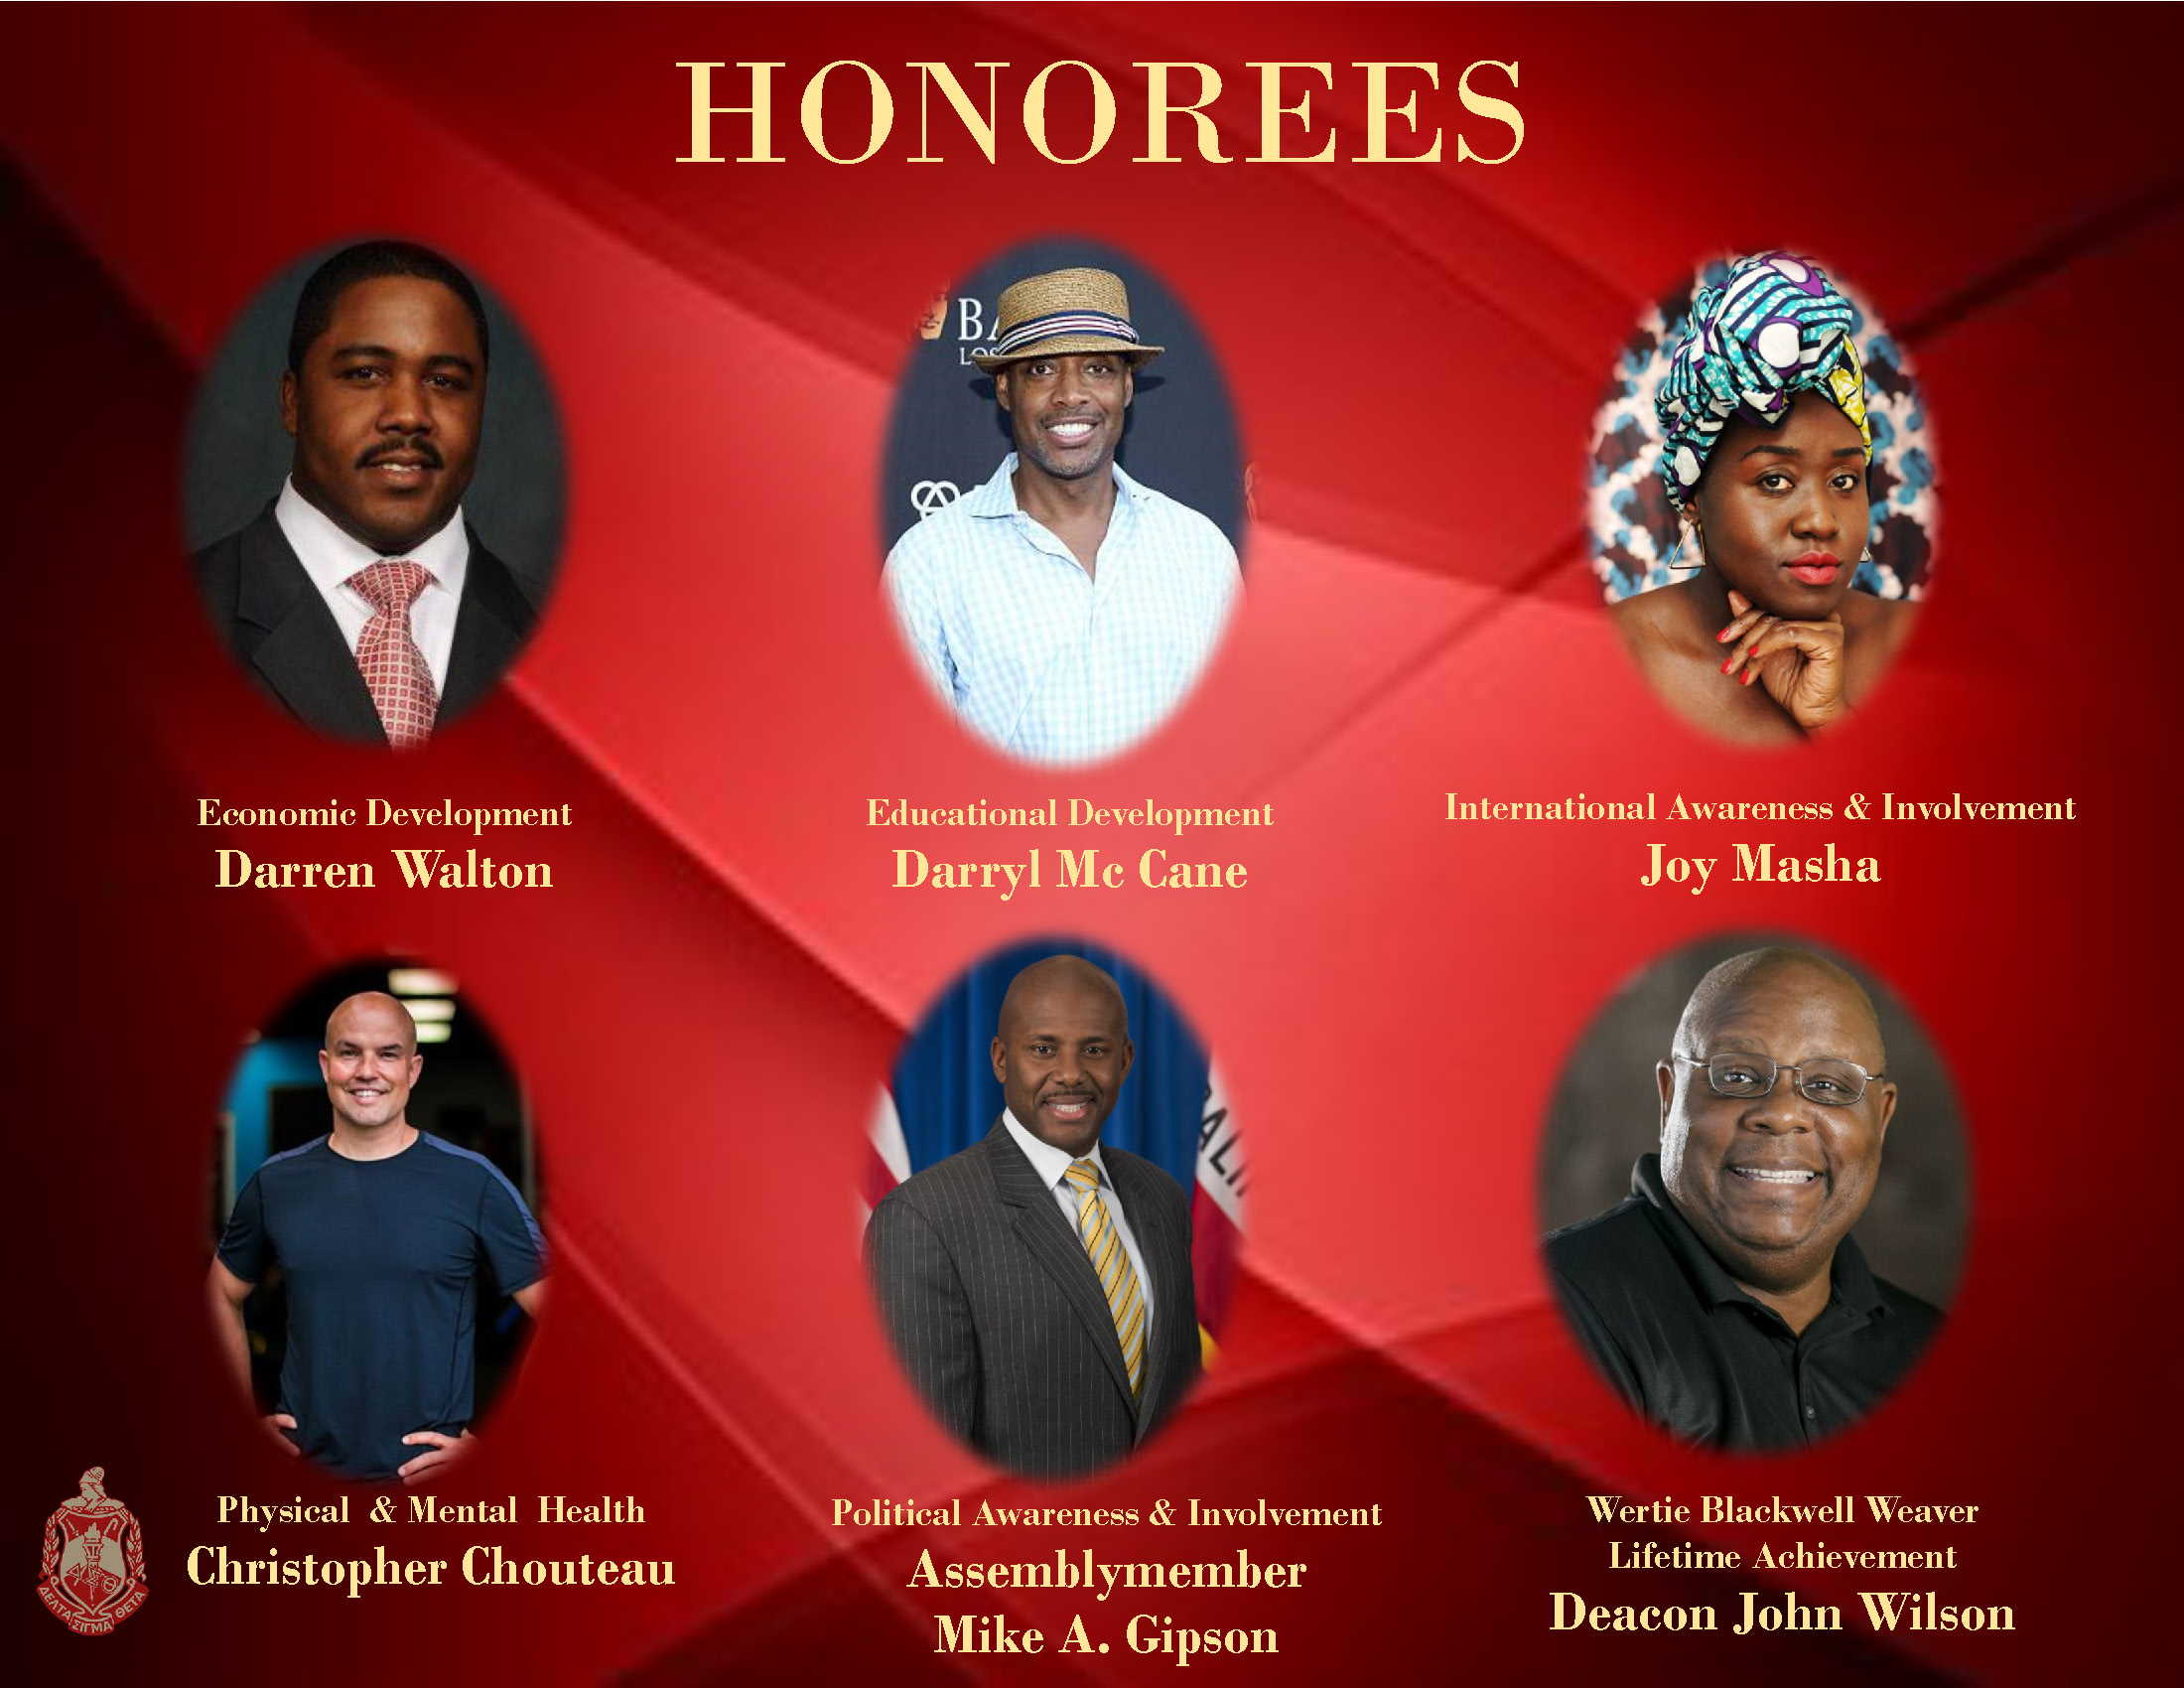 2018 Delta Spirit Awards Honorees (2)_Page_2.jpg